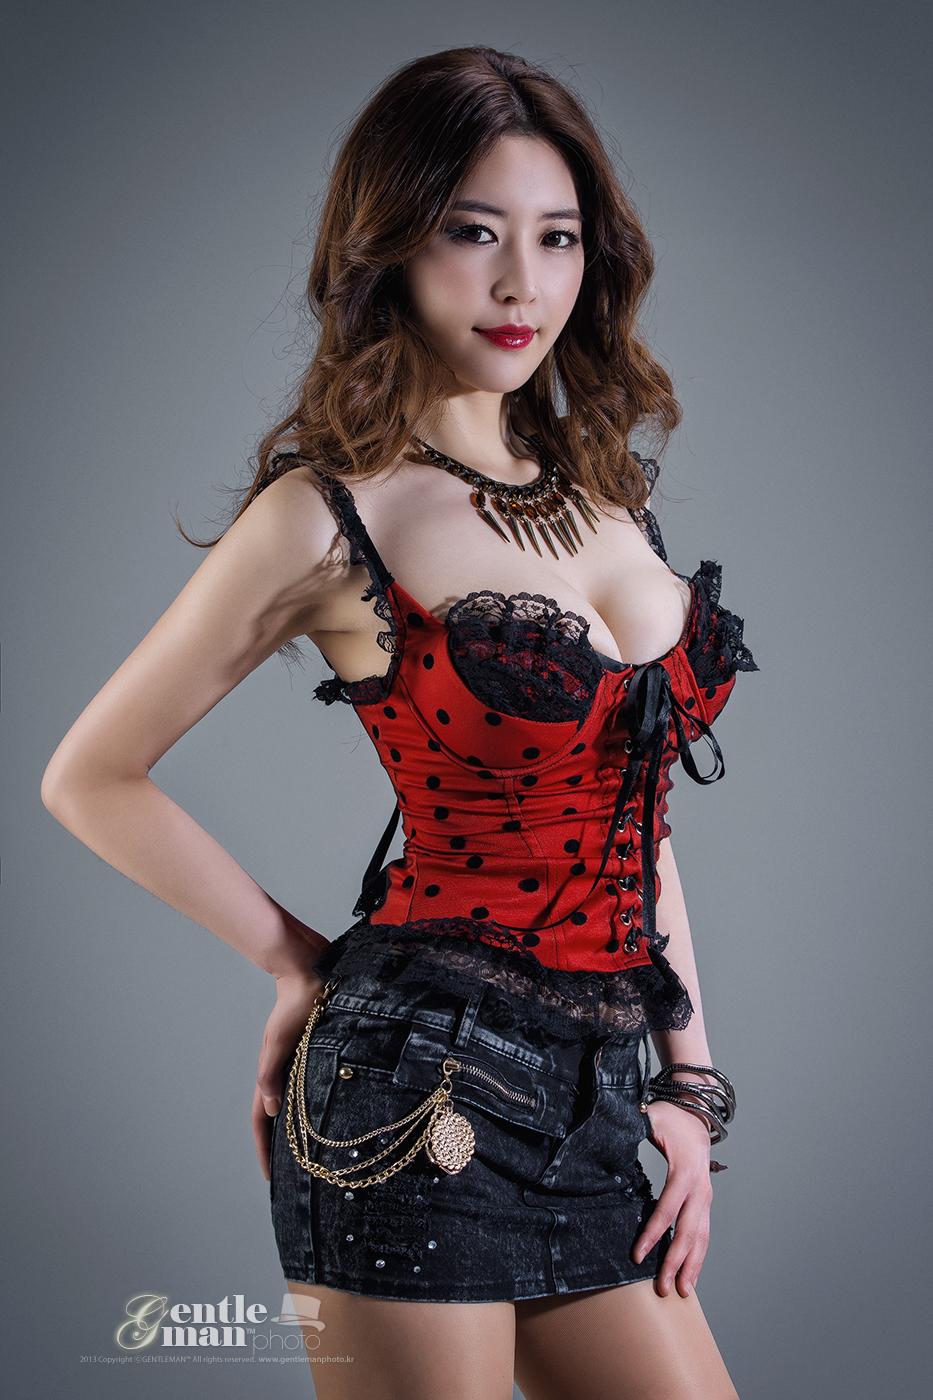 Fotos Kim Yoo Yeon nudes (22 photo), Pussy, Hot, Twitter, cameltoe 2006